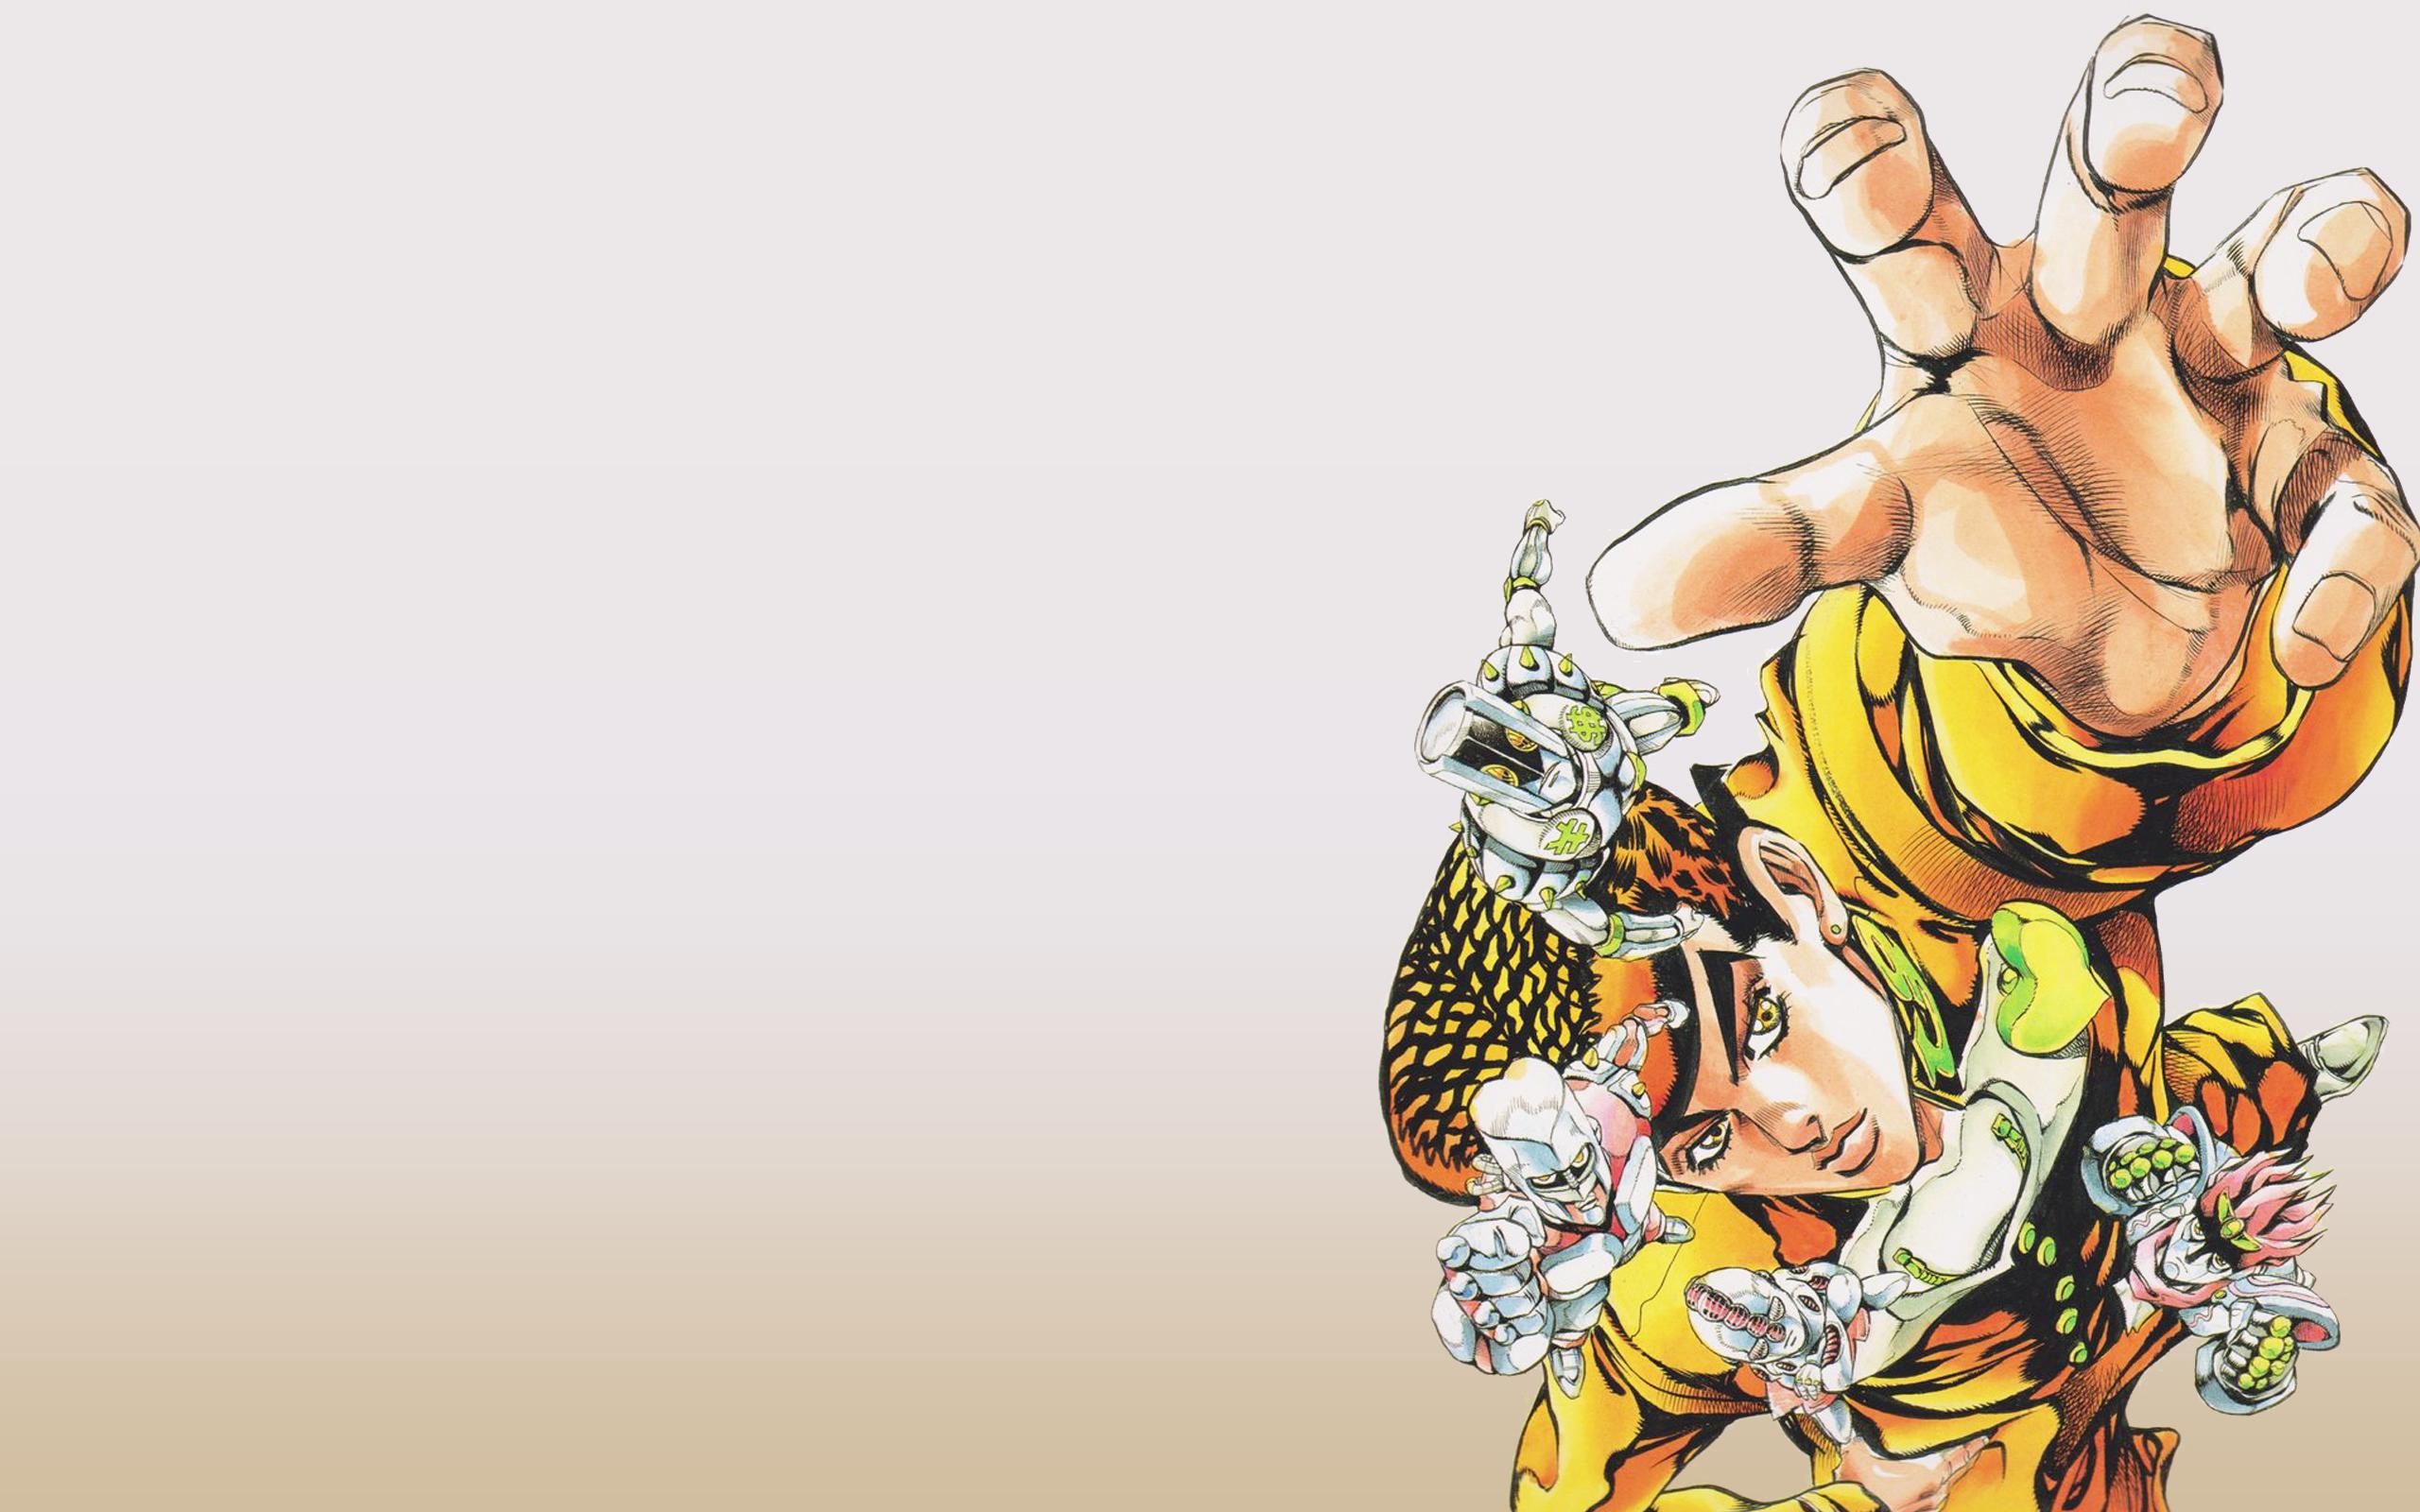 Wallpaper Jojo S Bizarre Adventure Anime Manga Steel Ball Run